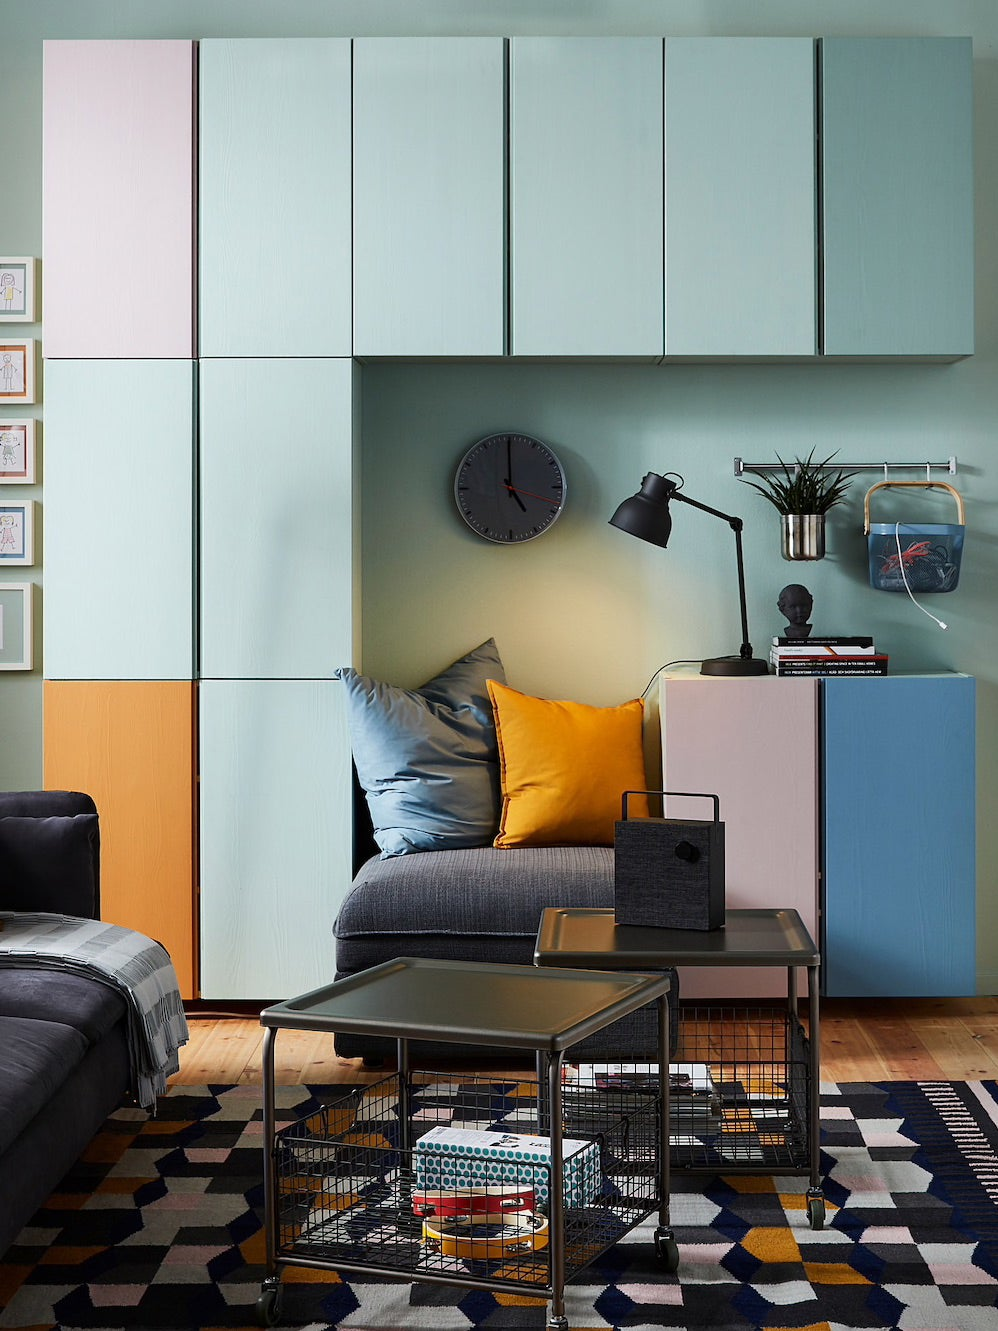 ikea-small-bedroom-furniture-domino-ivar